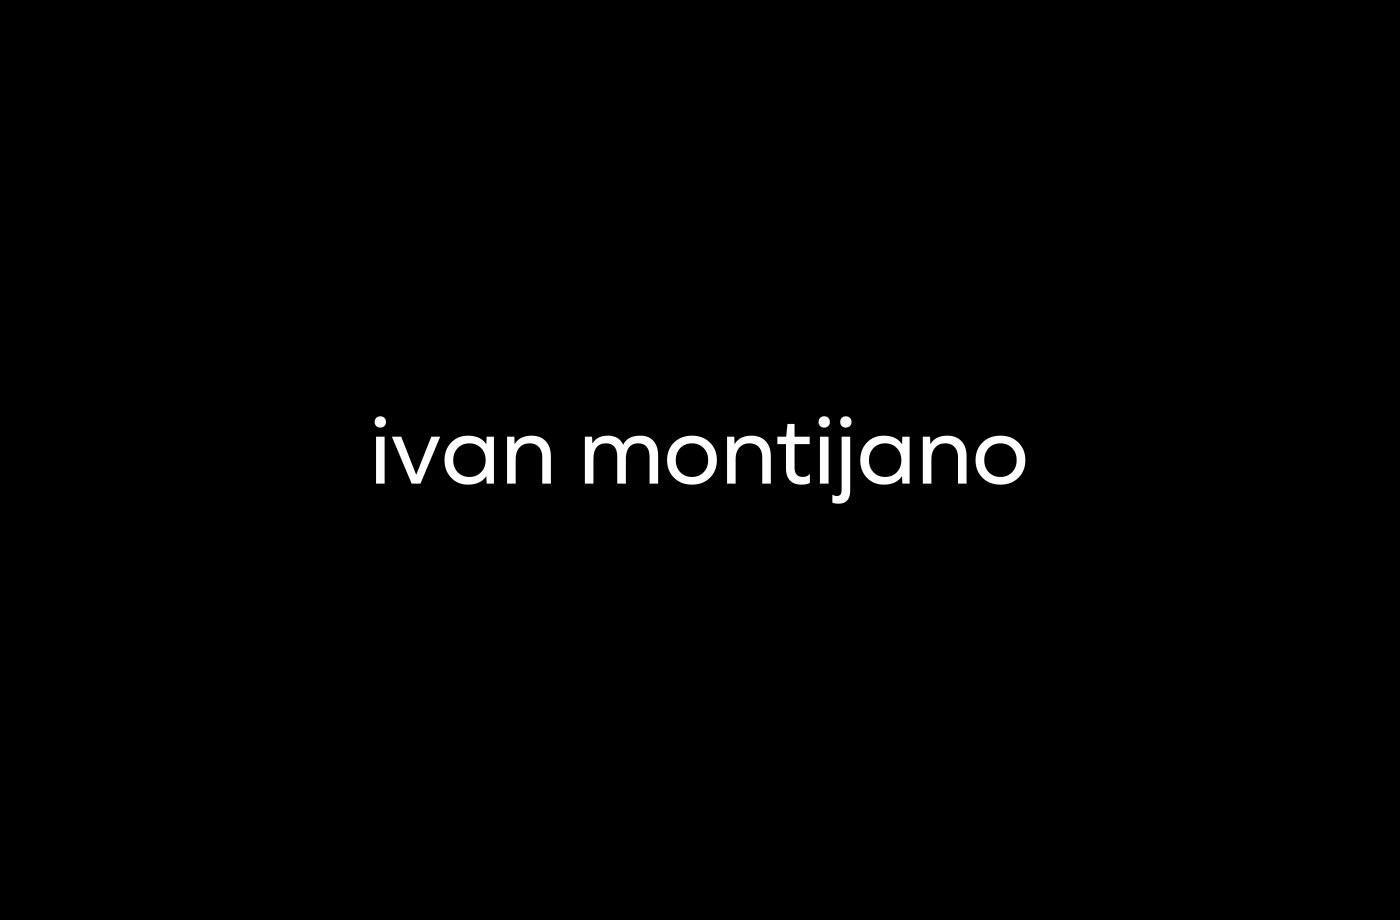 ivan-montijano-im-00